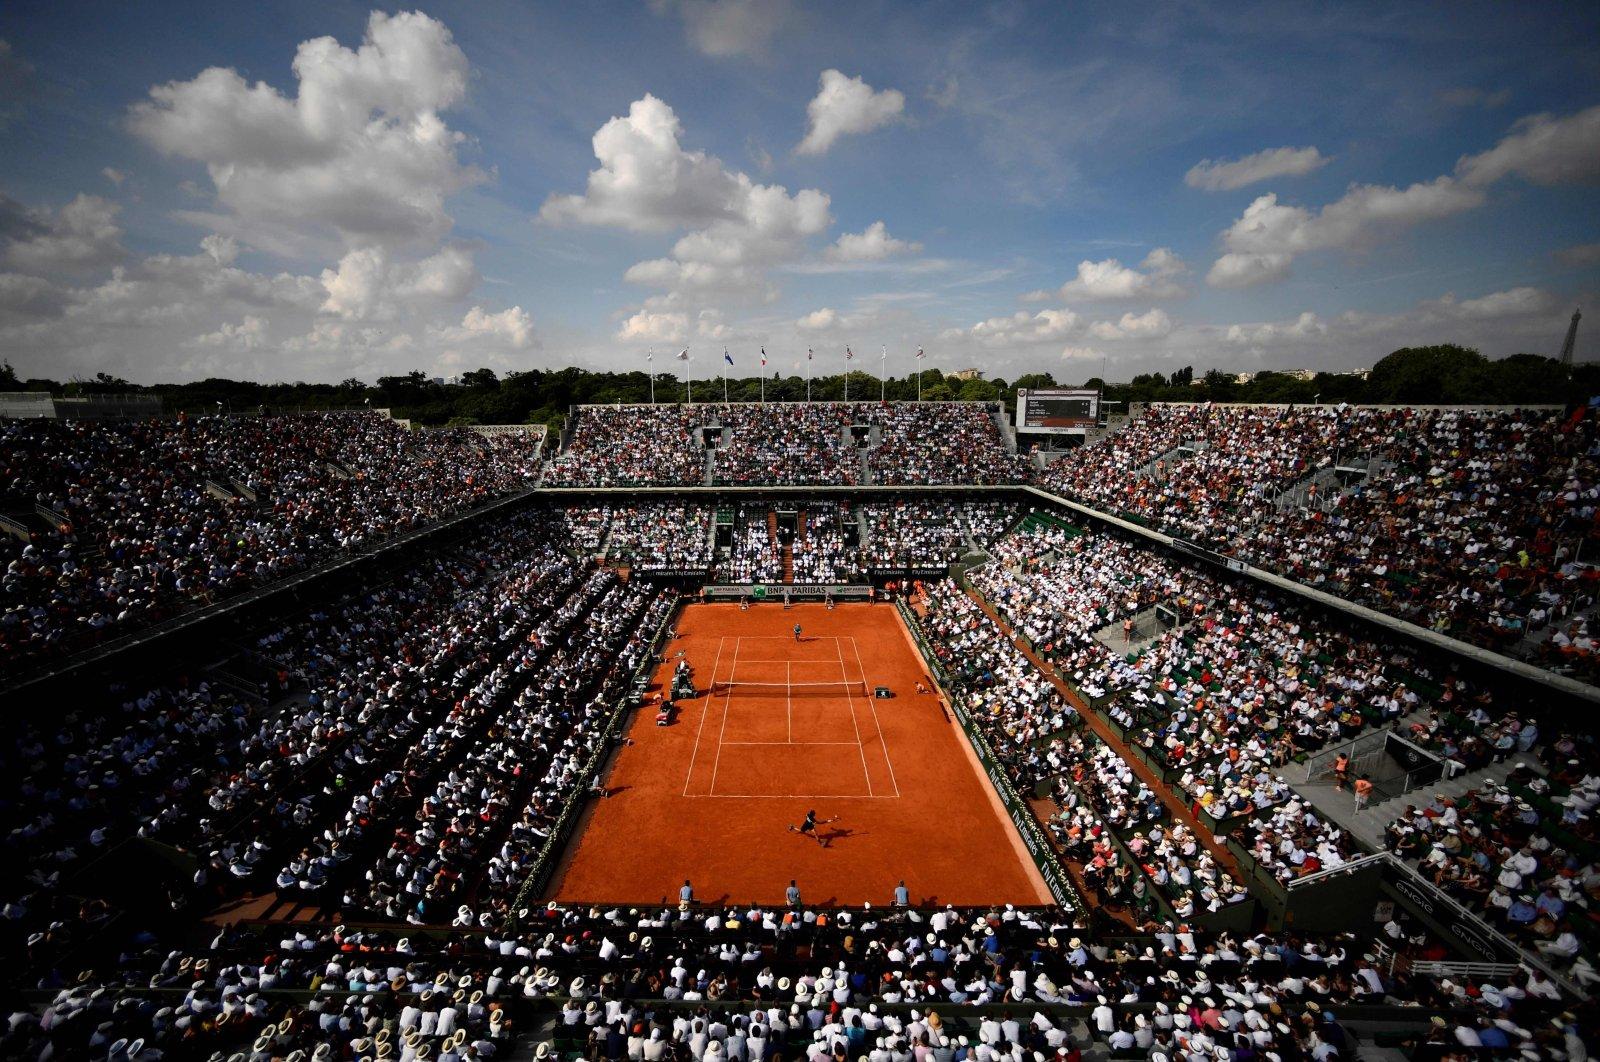 Spectators watch men's singles semi-final at Roland Garros 2018 tournament in Paris, France, June 8, 2018. (AFP Photo)